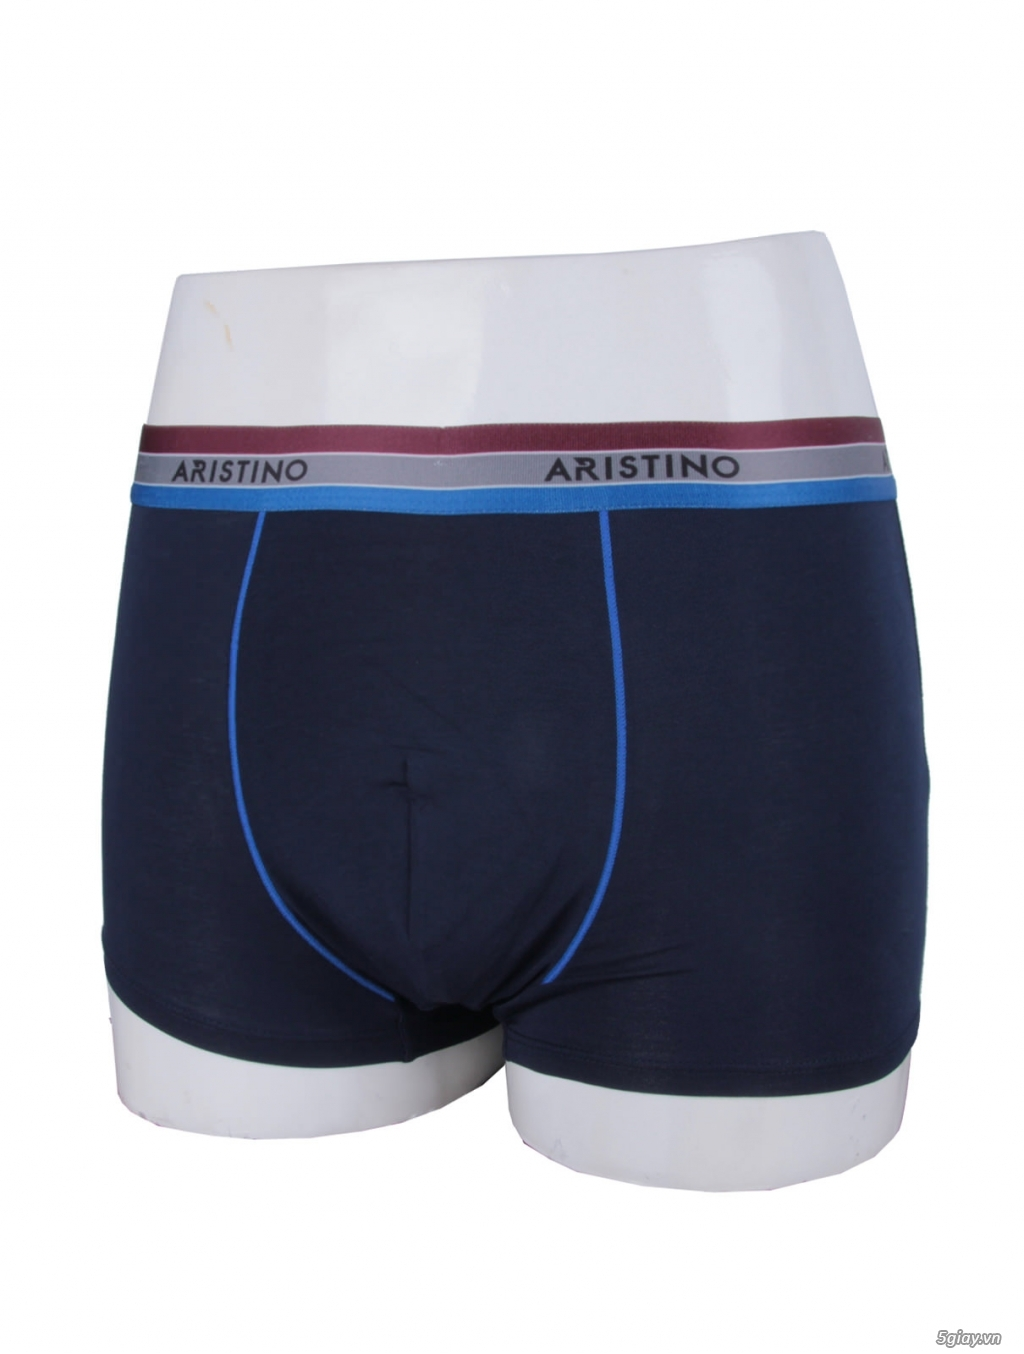 Quần sịp nam cao cấp hiệu Aristino - 2